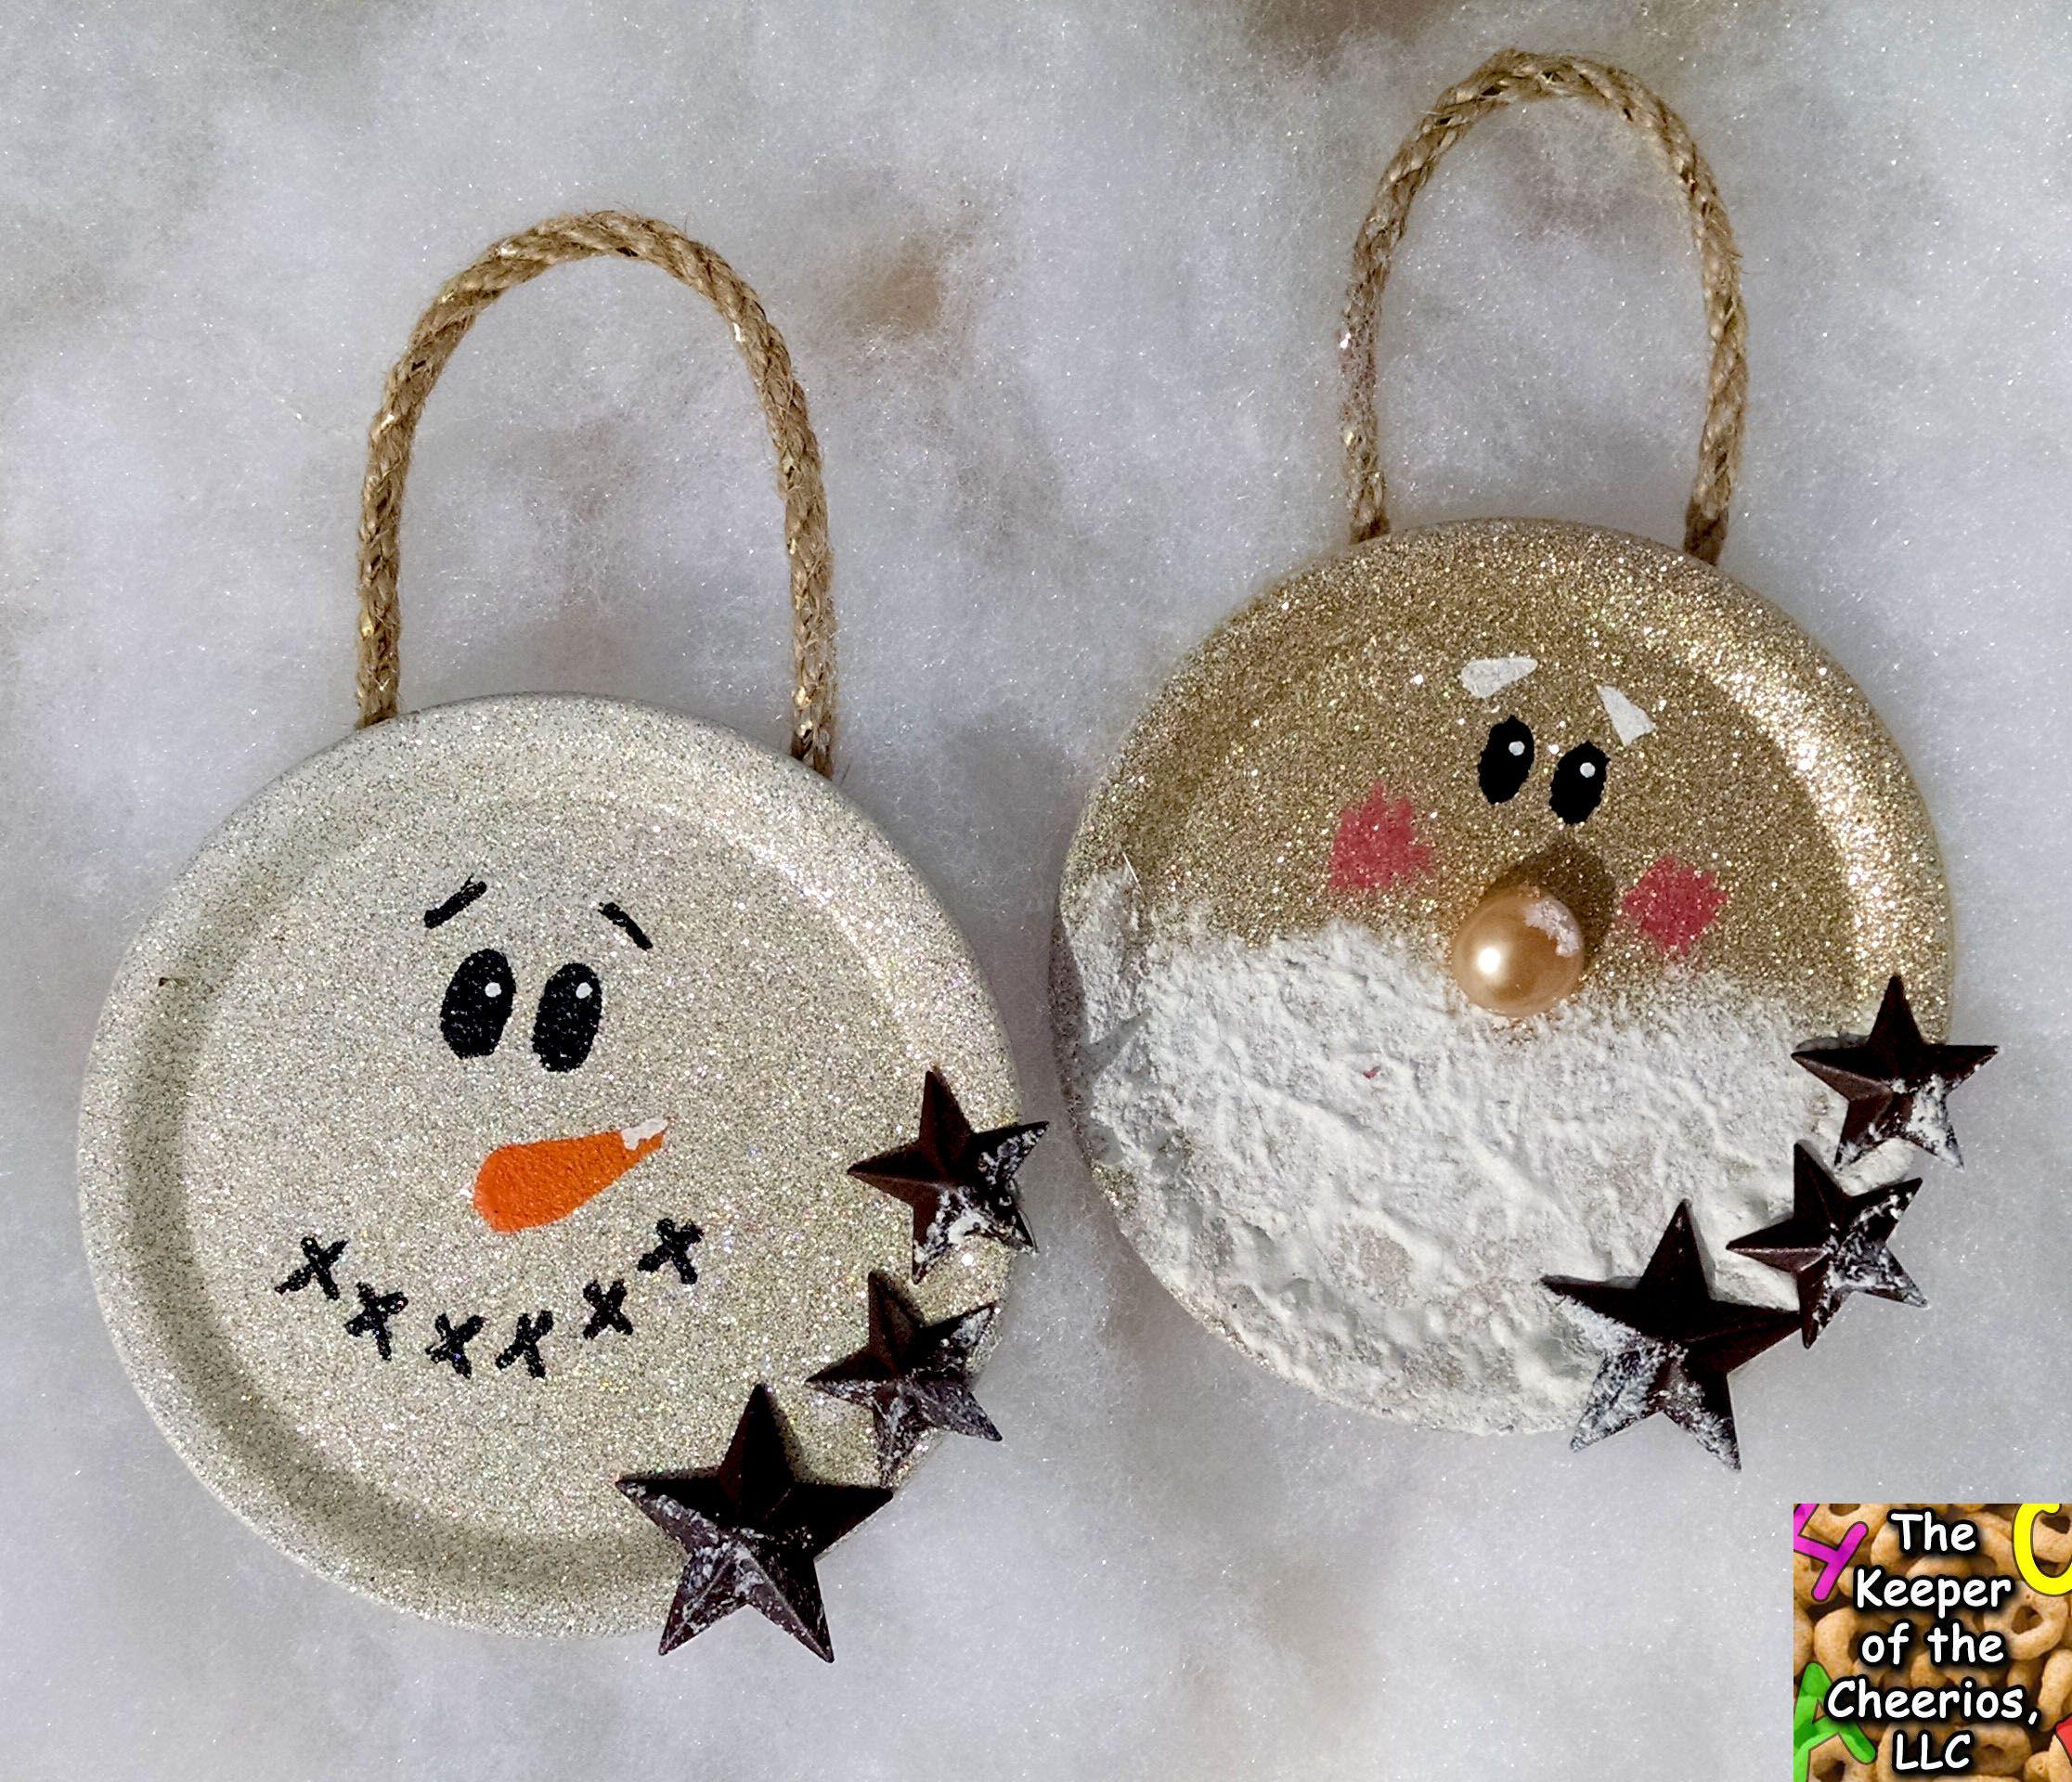 Mason jar ornaments - Mason Jar Lid Christmas Ornaments 2